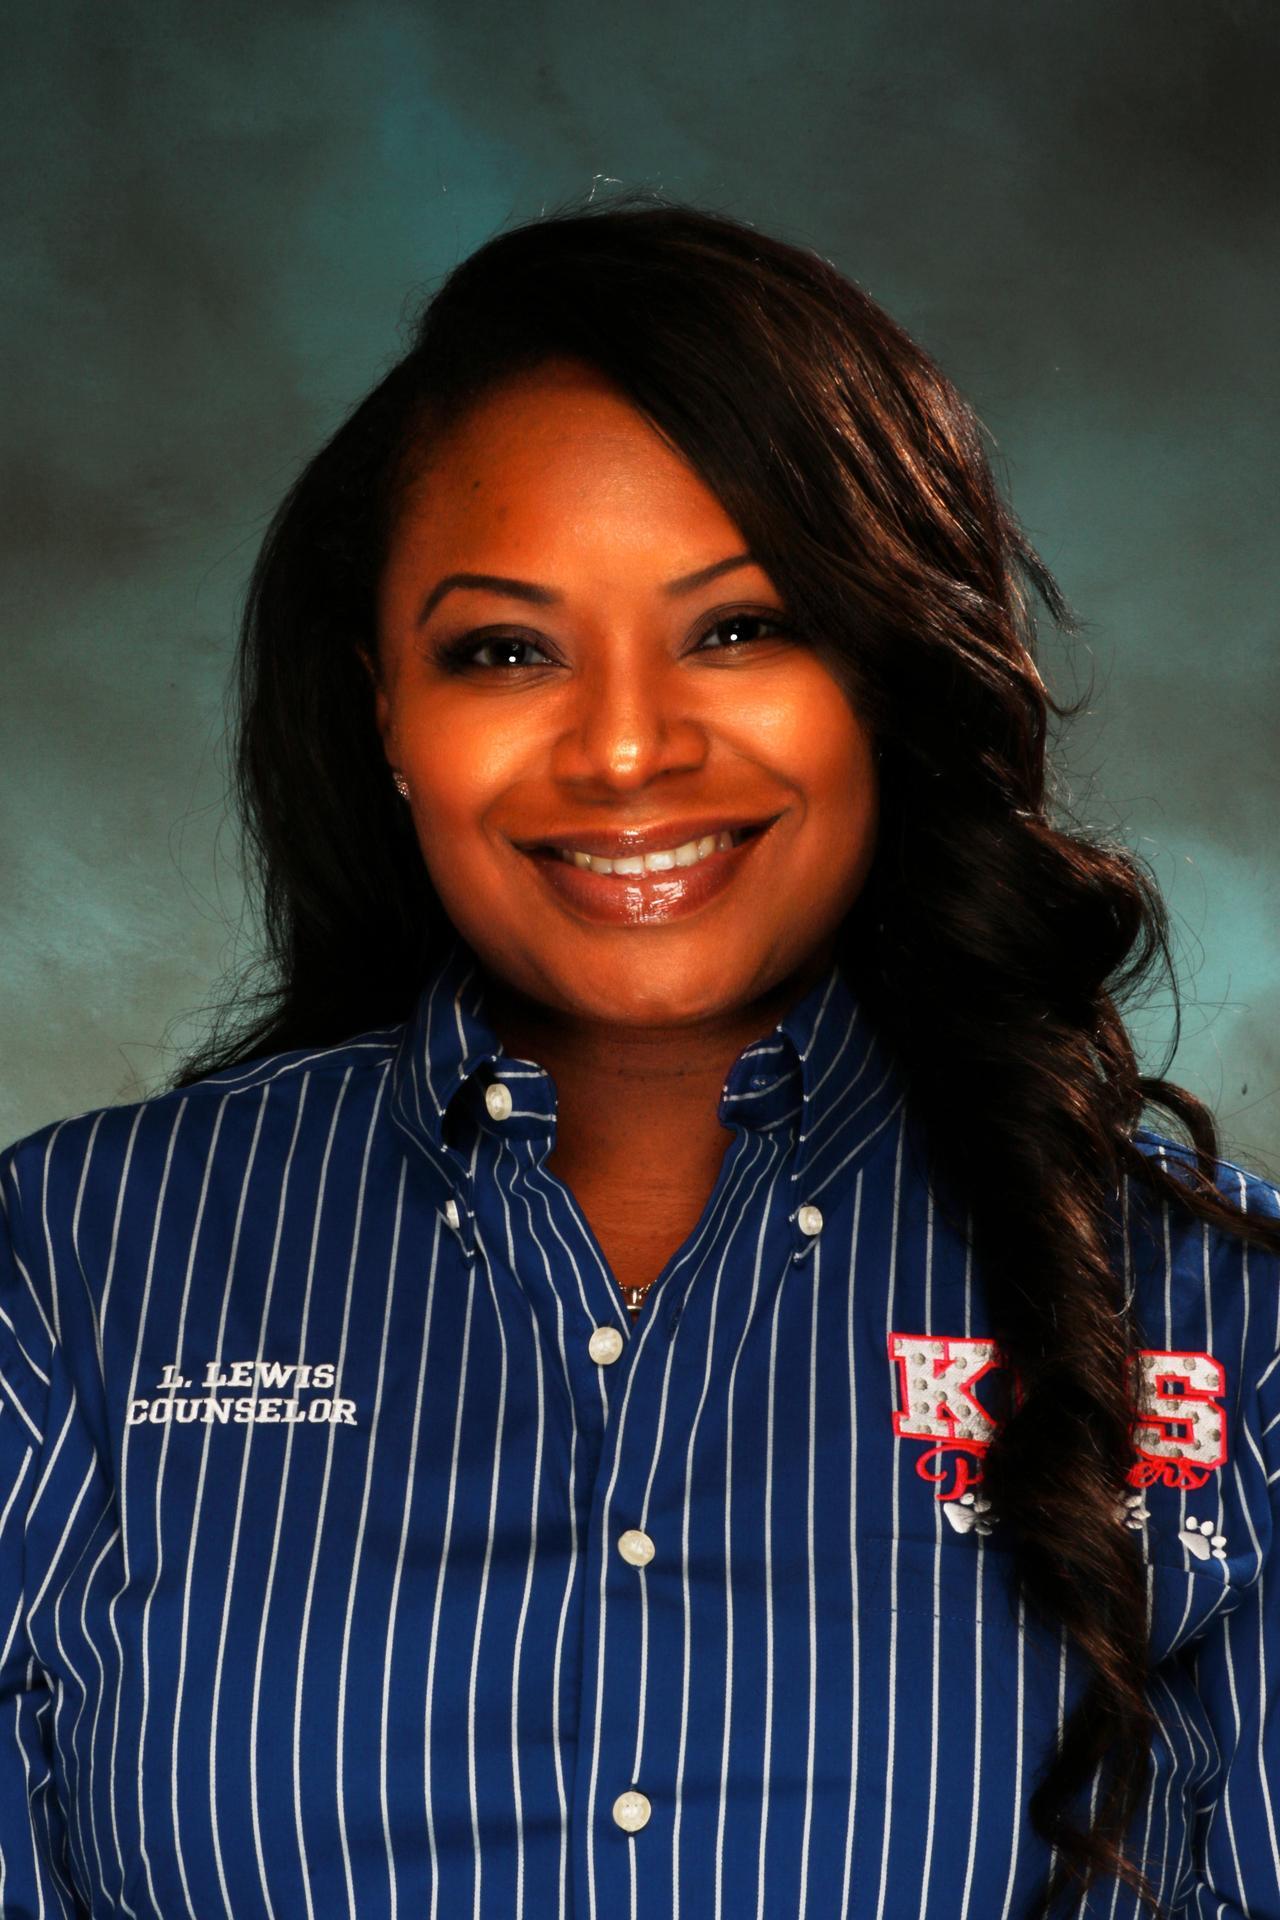 Ms. Lewis